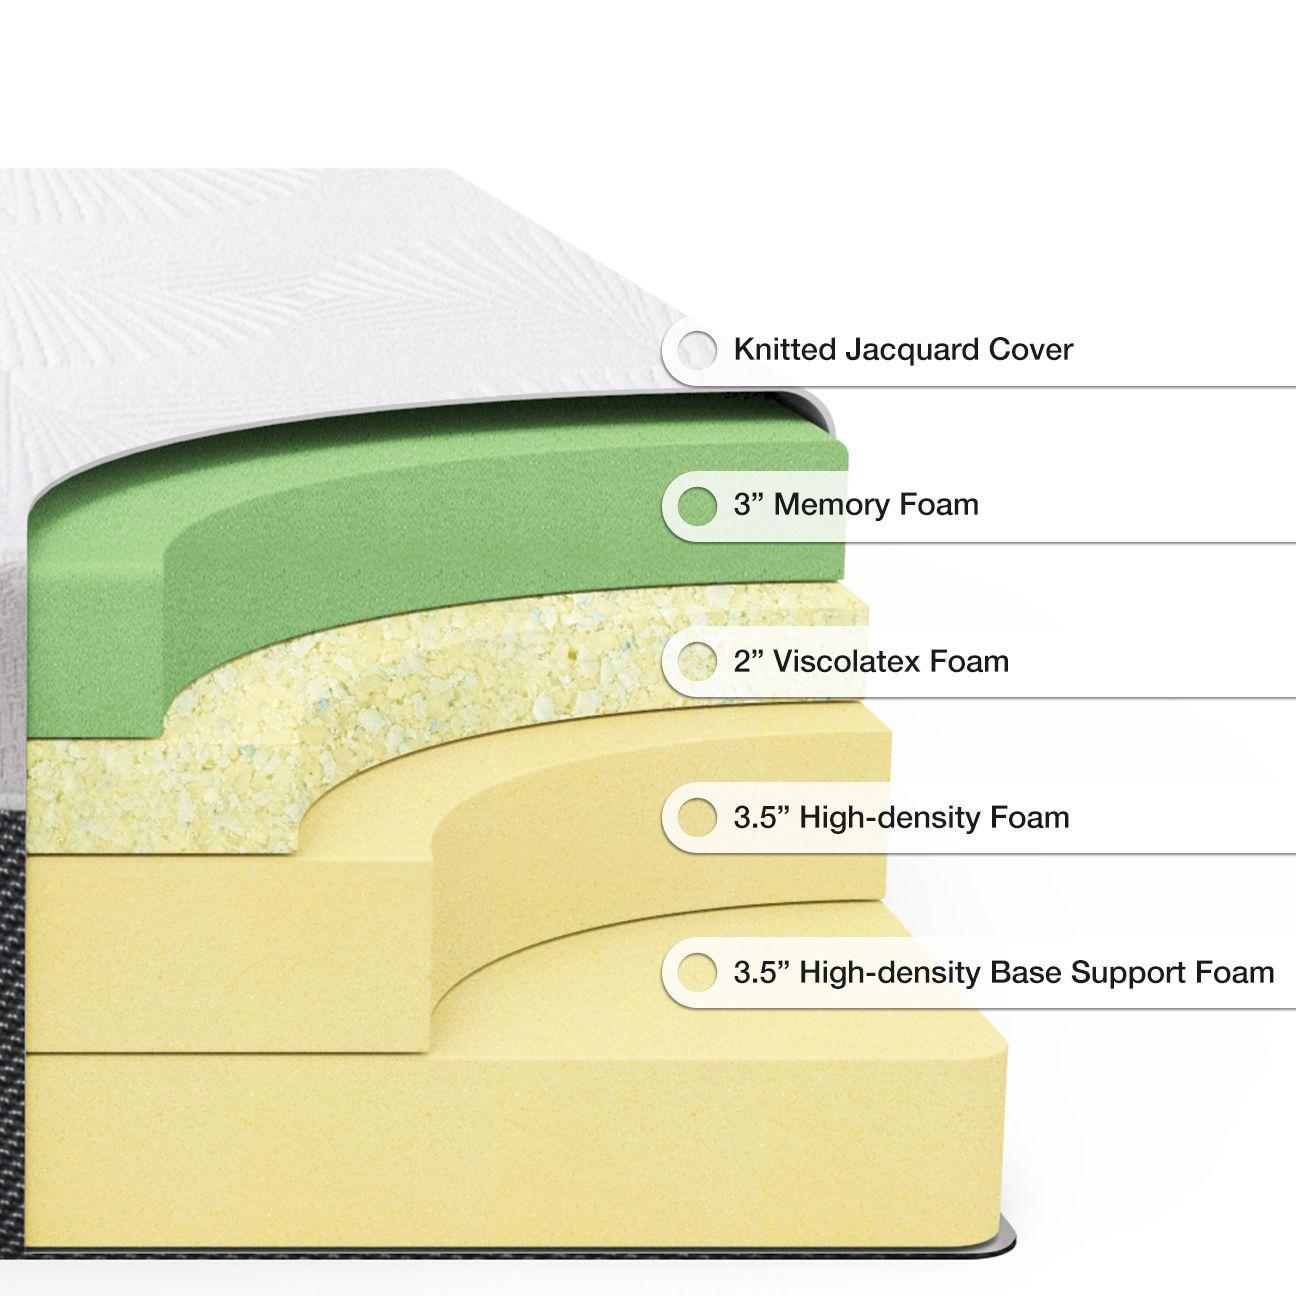 Spa Sensations By Zinus 12 Inch Eco Sense Memory Foam Mattress Inch Zinus Spa Spa Sensations Memory Foam Mattress Foam Mattress